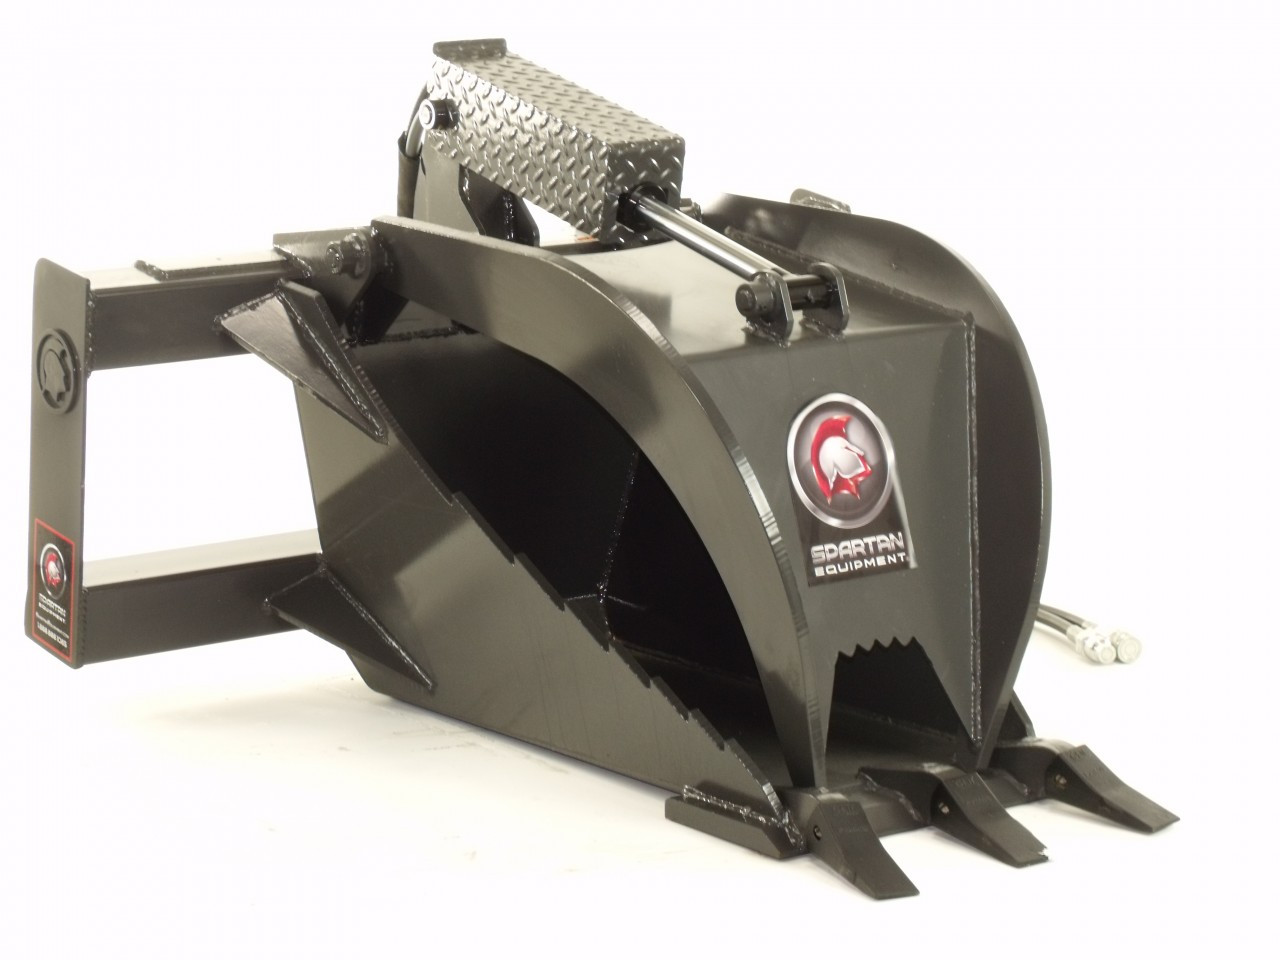 Skid Steer Stump Grapple Attachment Industrial Series